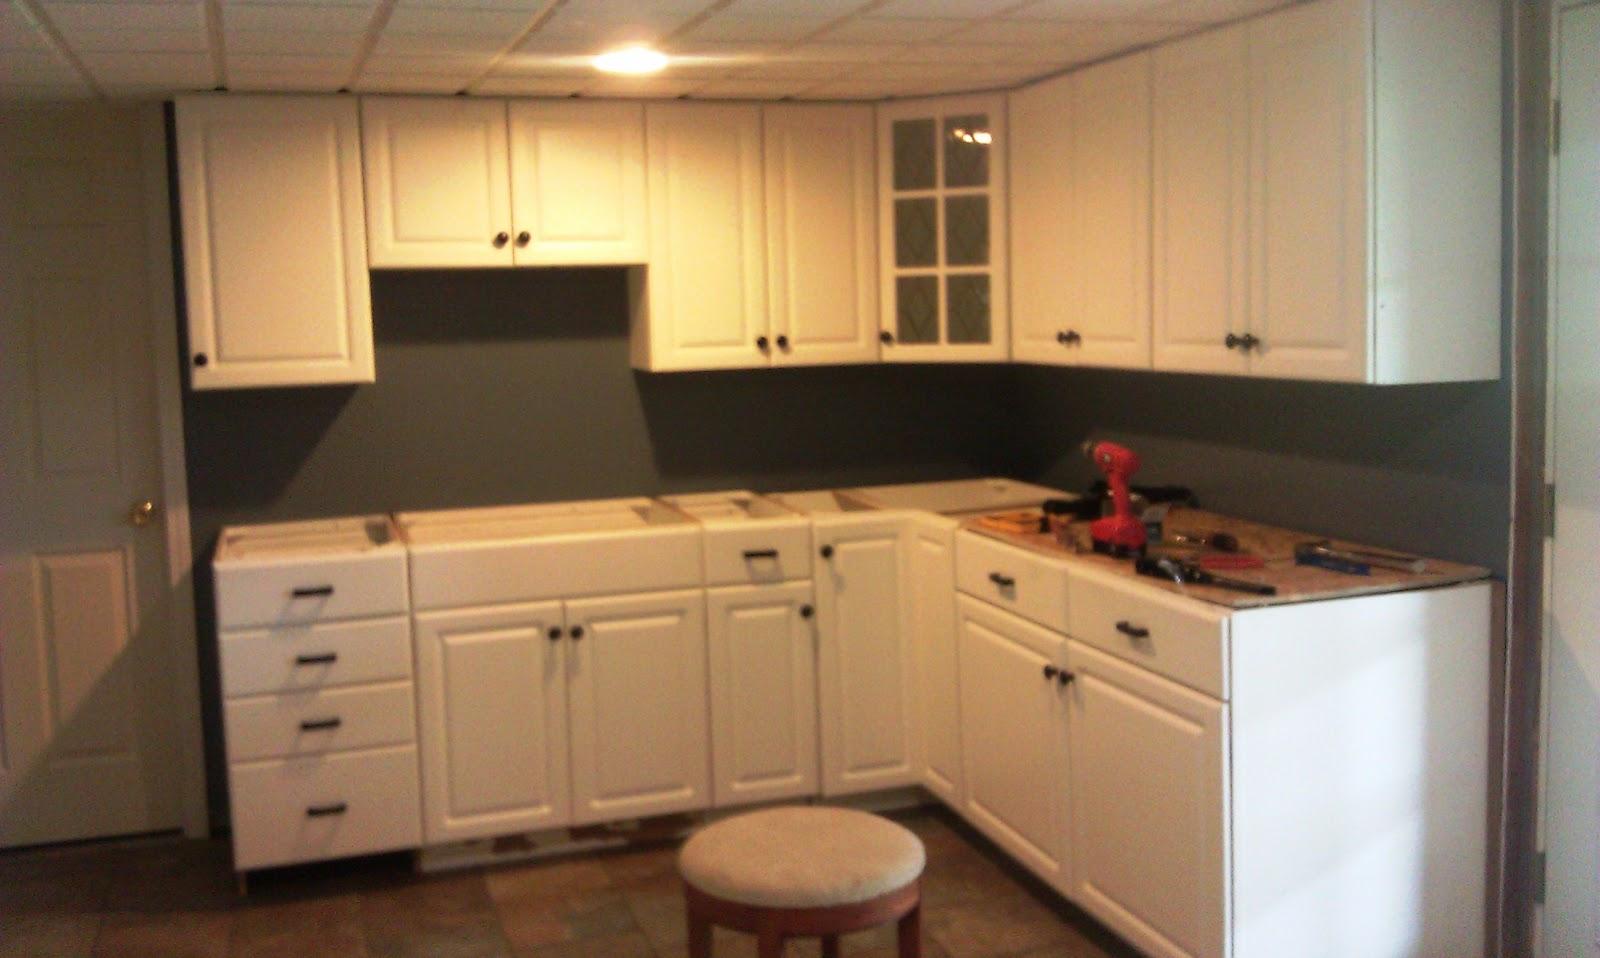 - Home Improvement Mom And Wife: Slate Backsplash With White Cabinets!